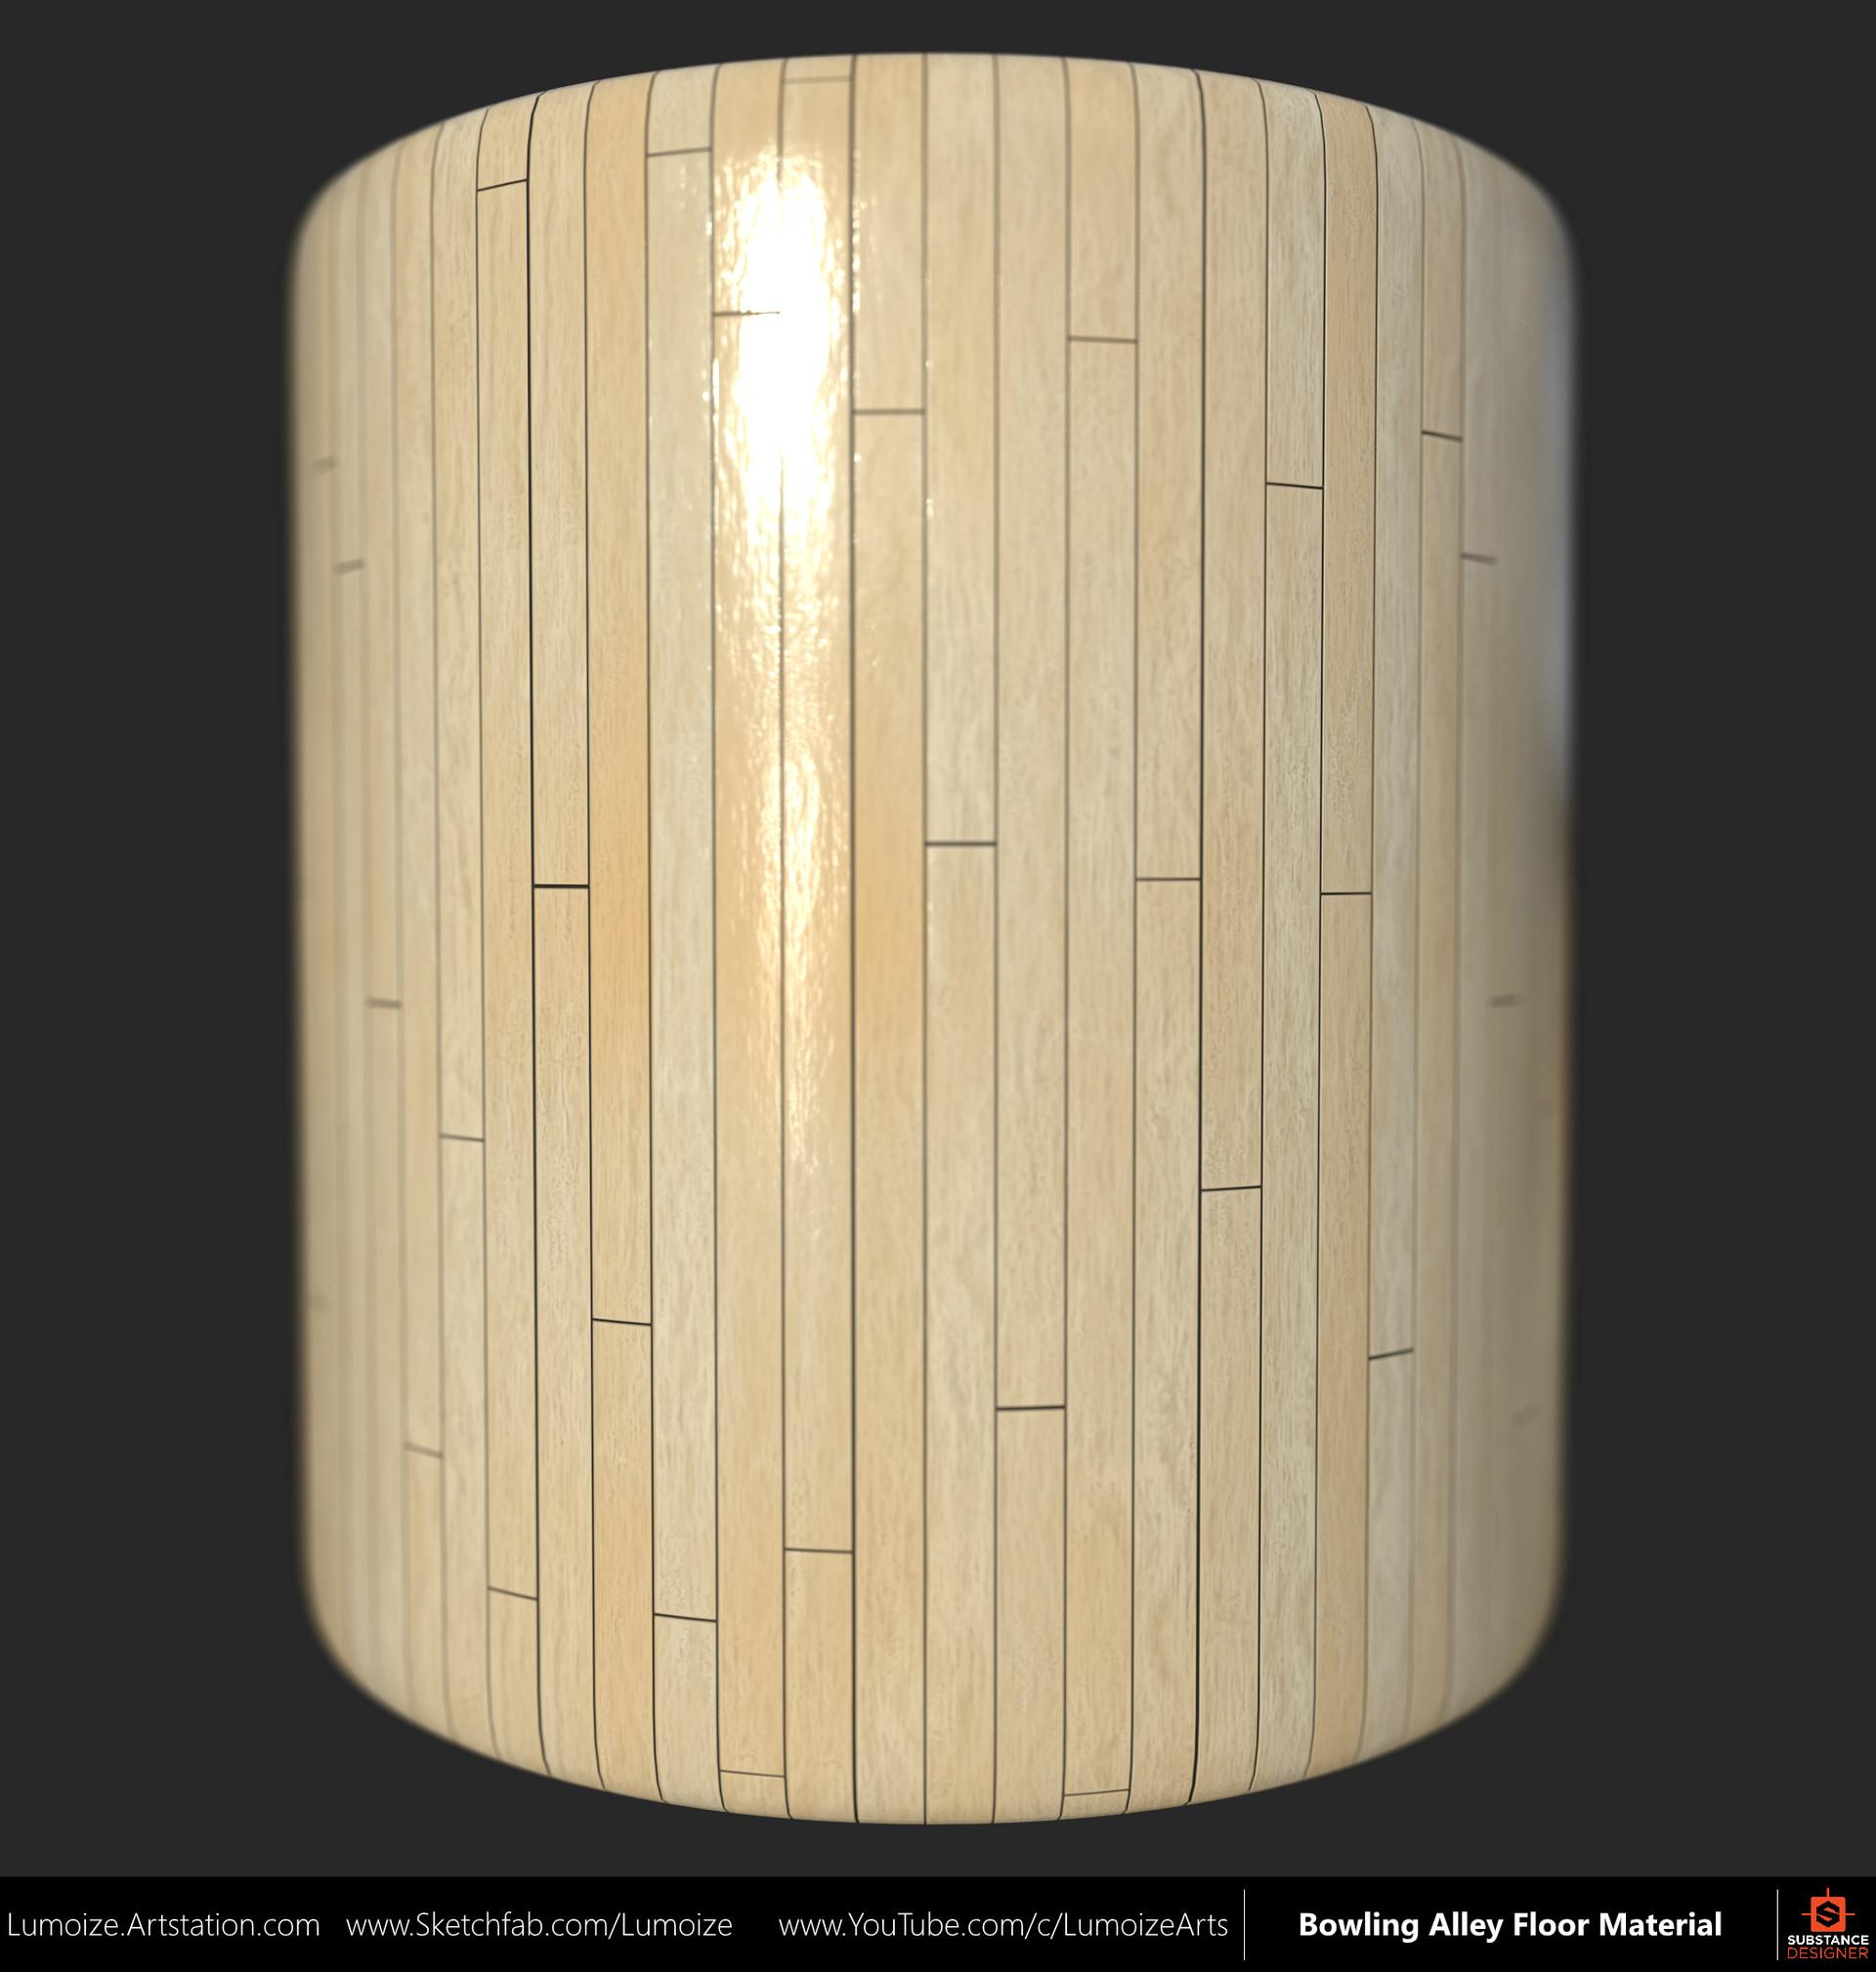 Brendon kibler woodclear